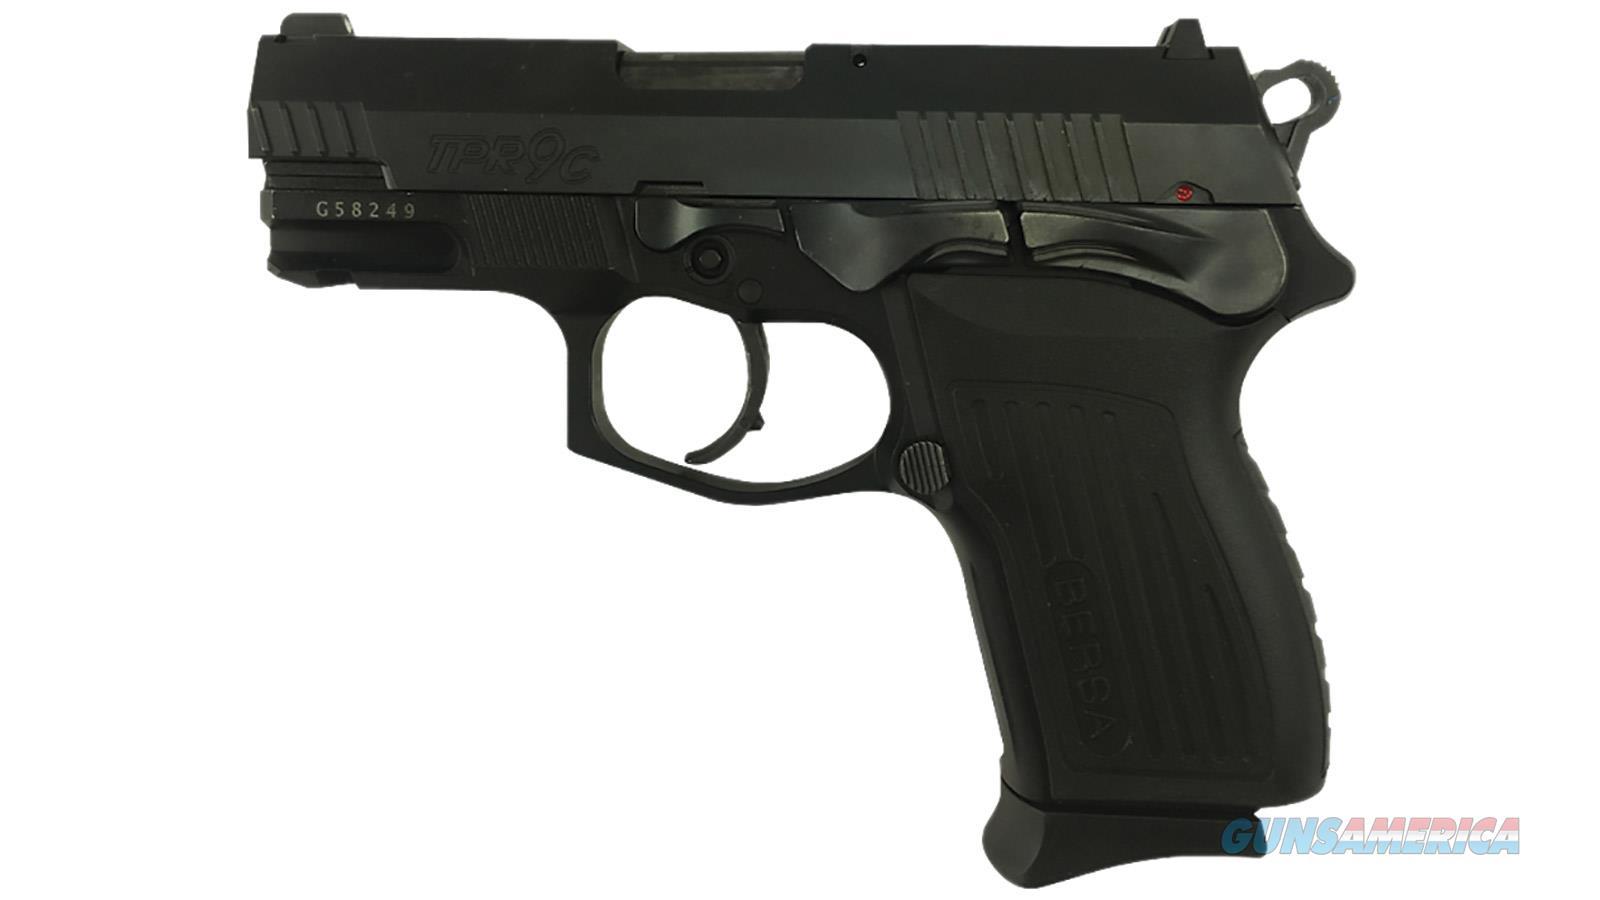 Tprc 9Mm Compact TPR9CM  Guns > Pistols > E Misc Pistols